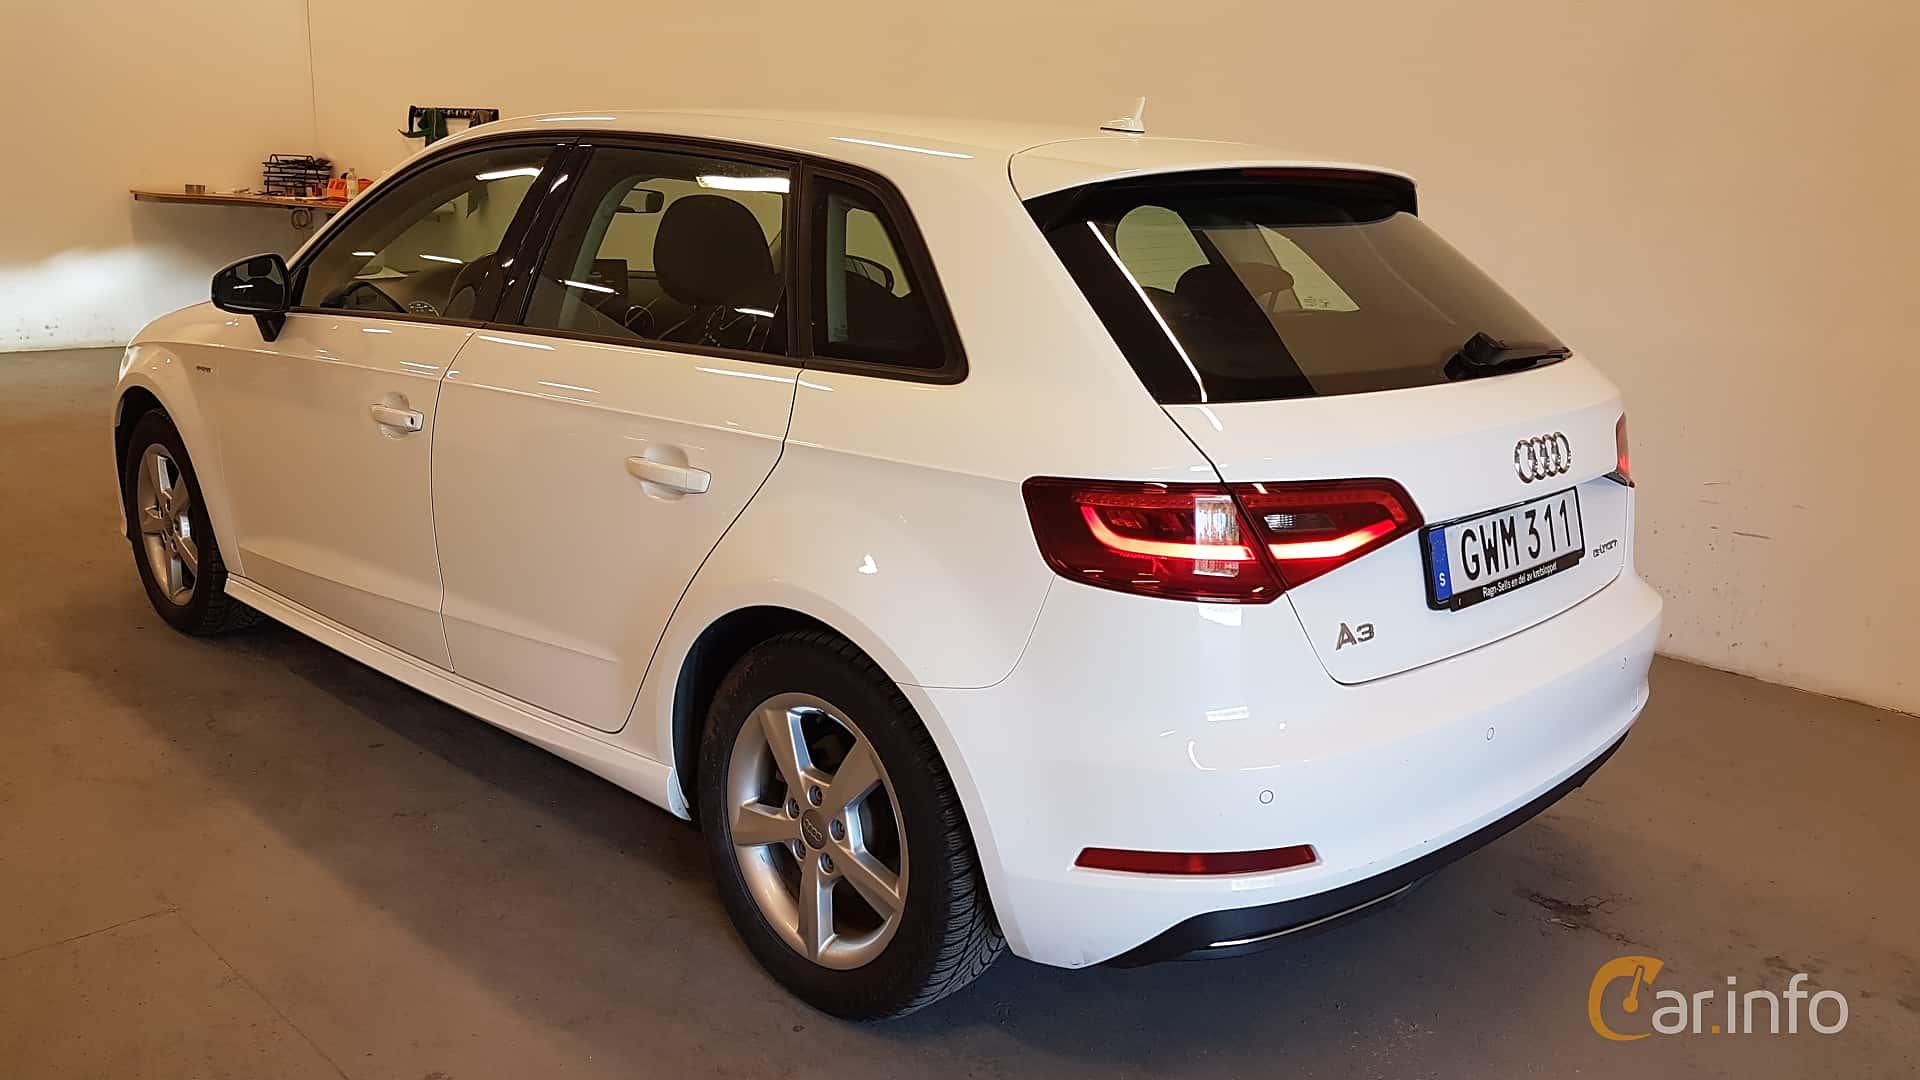 Audi A3 Sportback e-Tron 1.4 TFSI S Tronic, 204hp, 2016